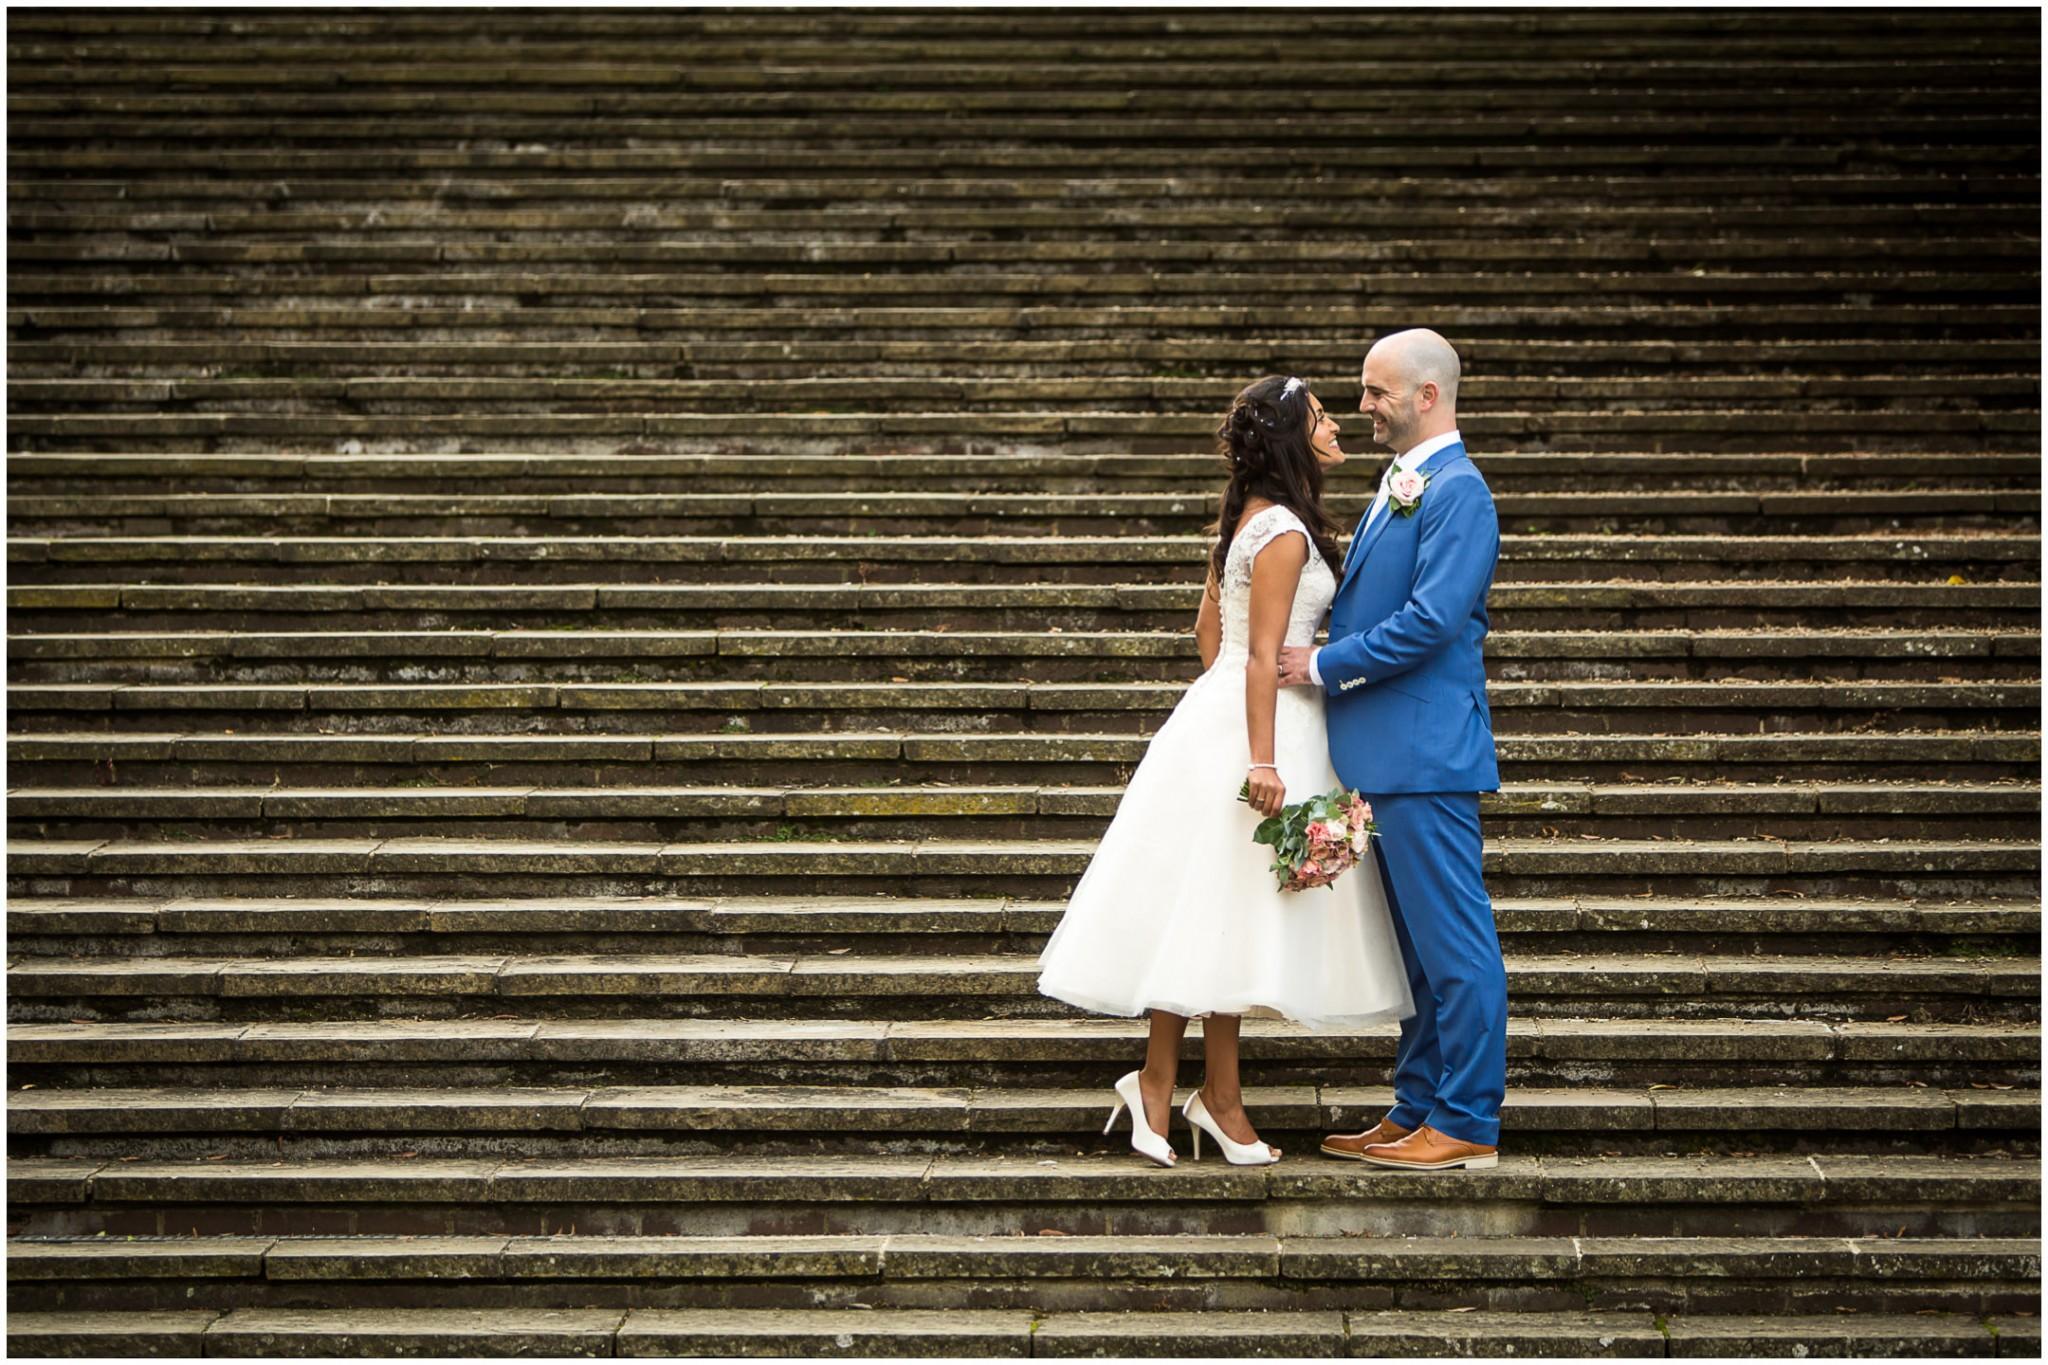 Basing Room wedding photographer Bride & Groom on steps